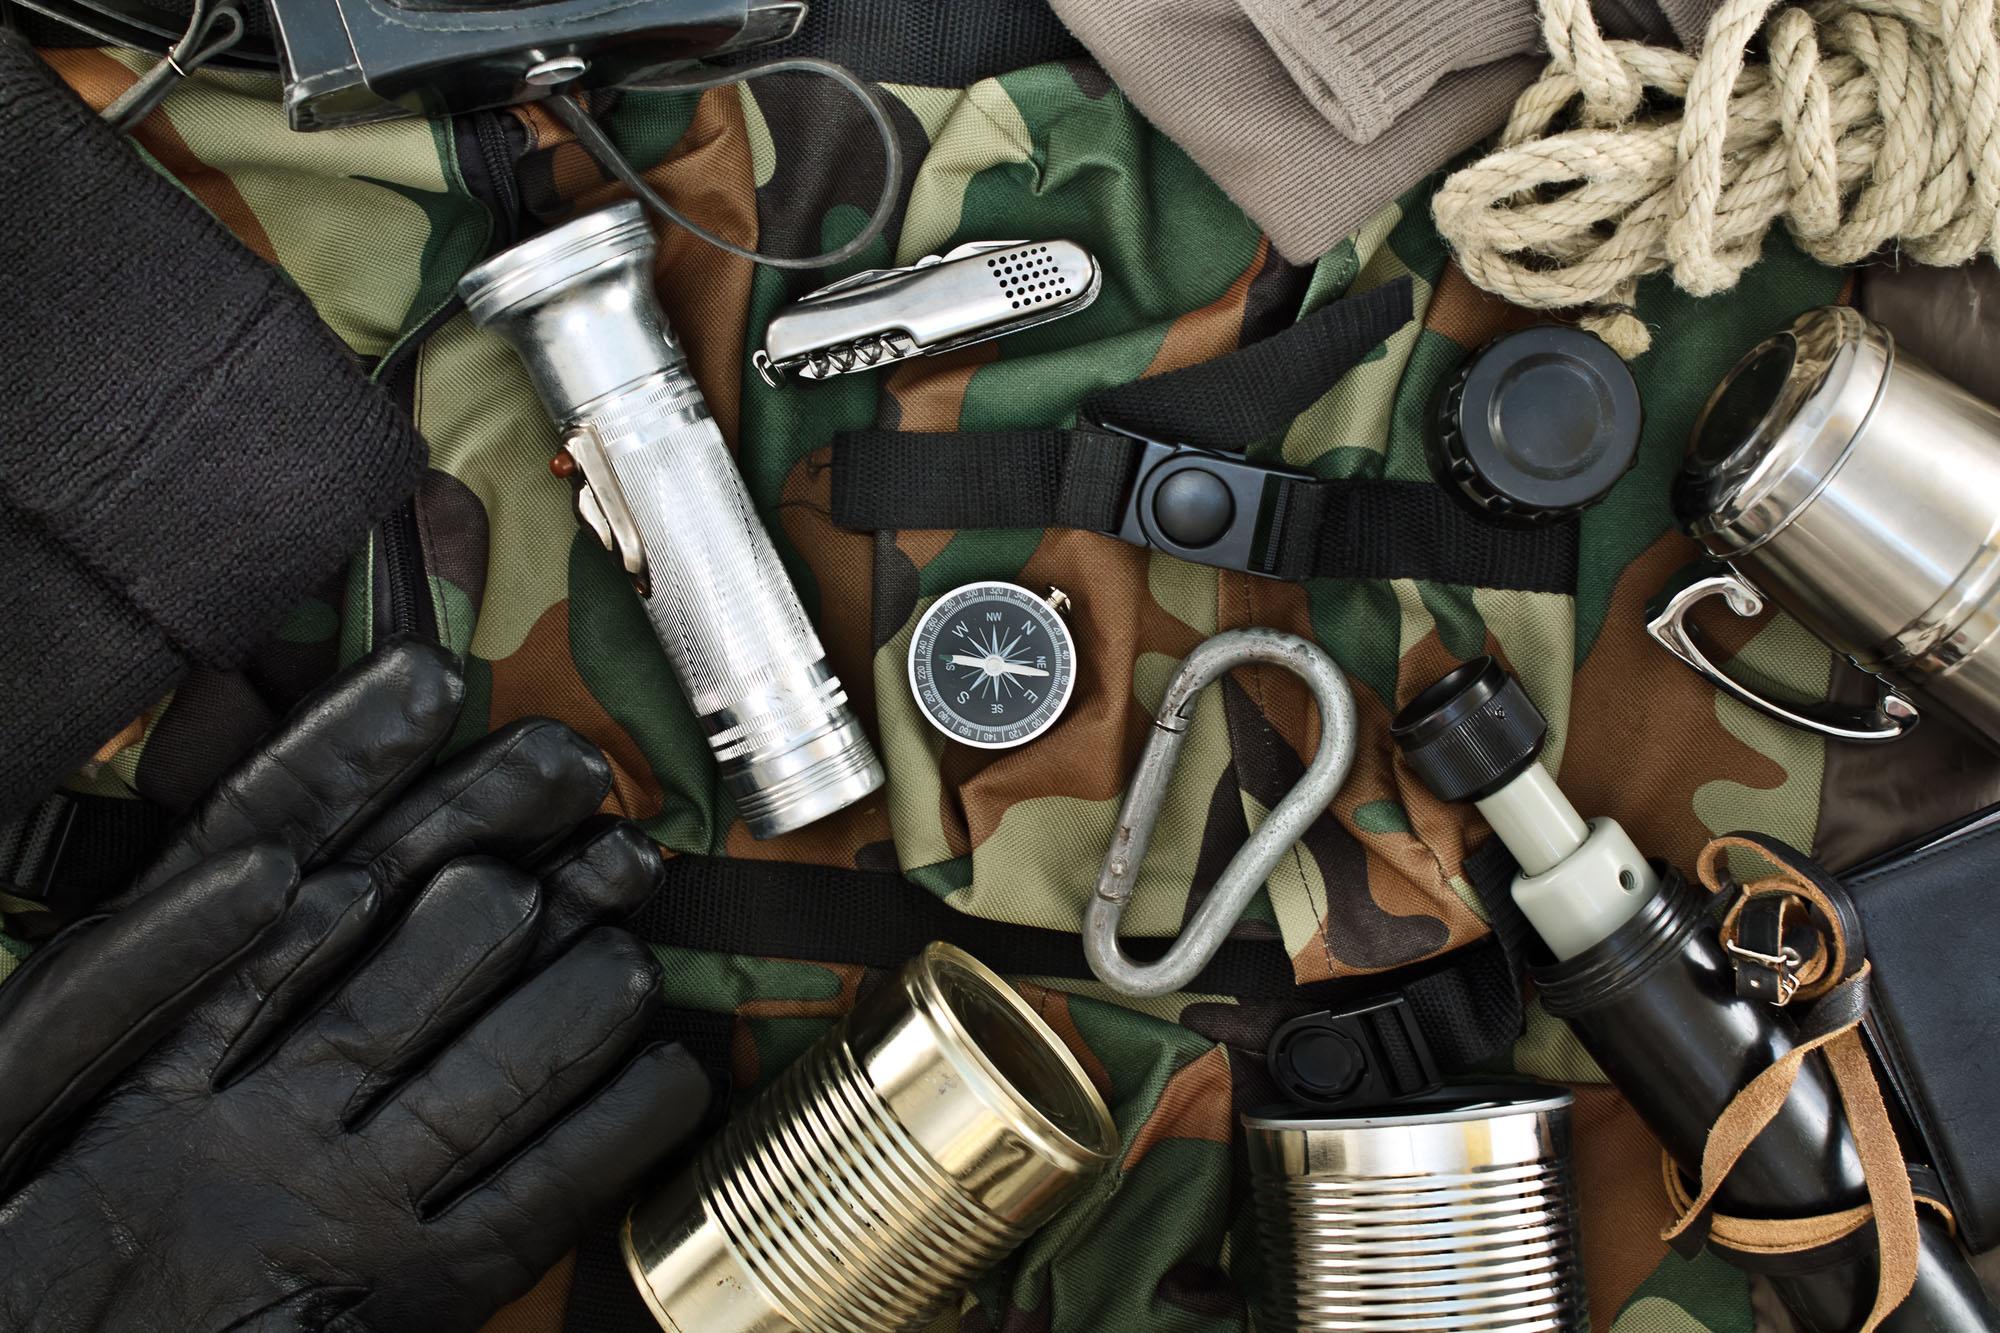 Survival kit zelf samenstellen of toch kopen?